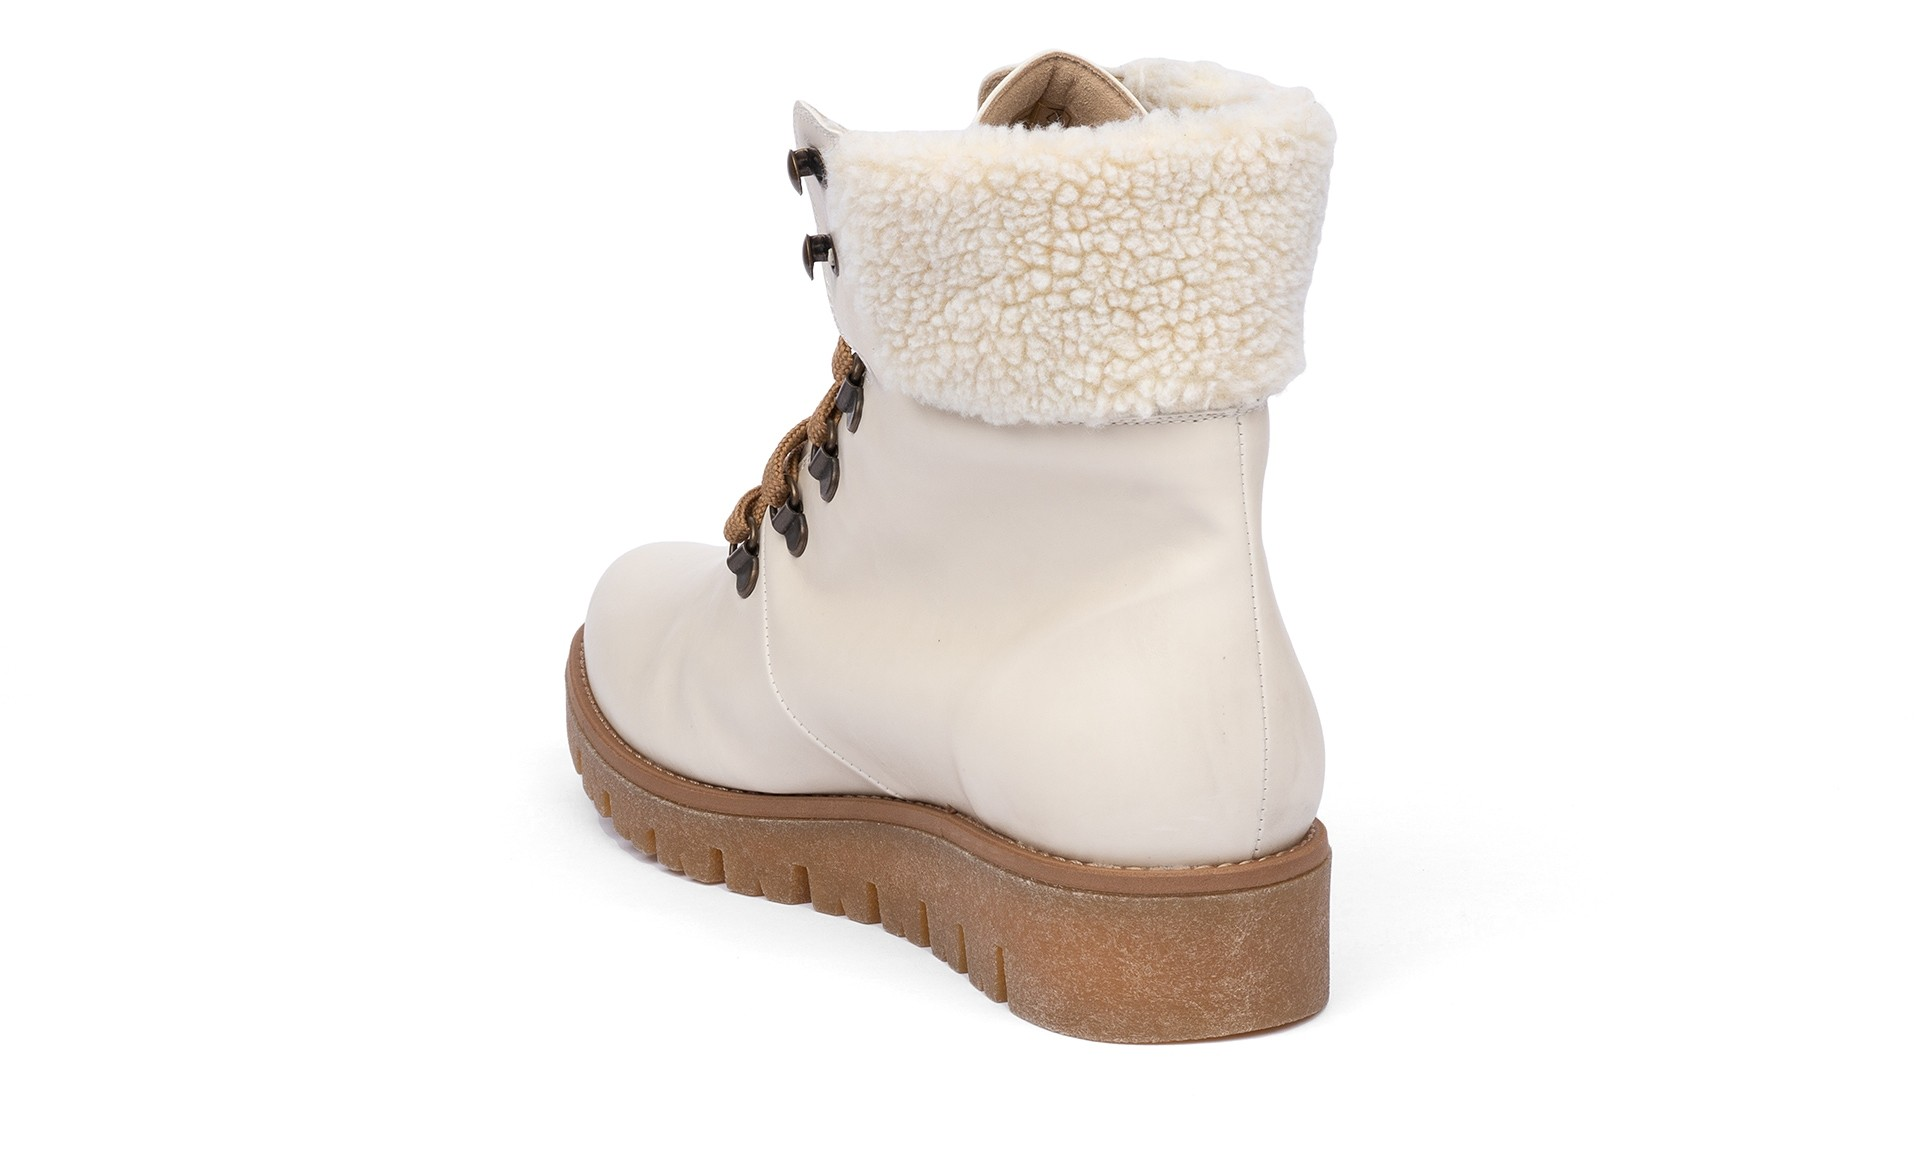 963c2af6b Vegan Women's Boots   BHAVA Aspen Hiker Ivory   avesu VEGAN SHOES